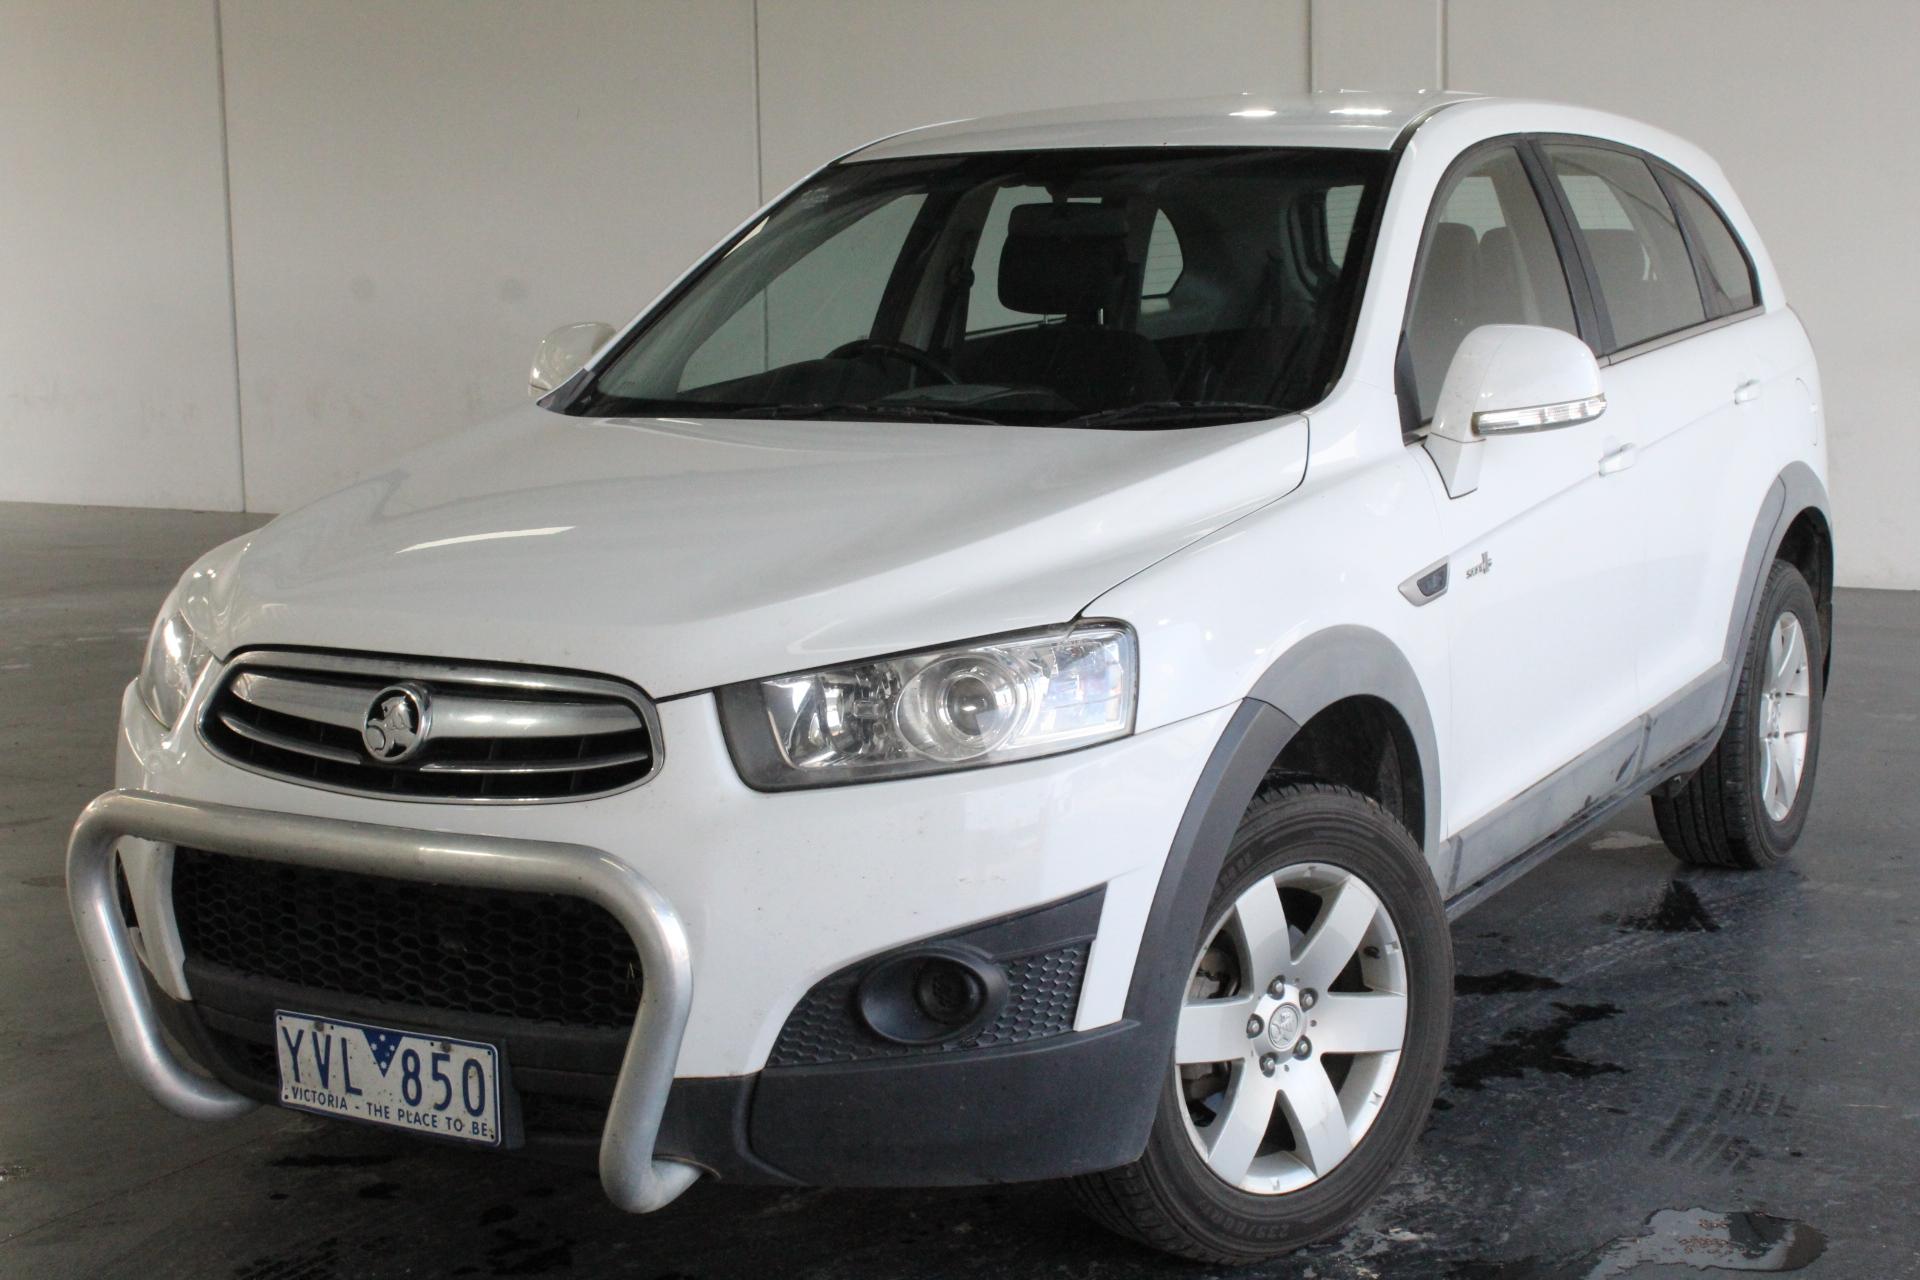 2012 Holden Captiva 7 SX 2WD CG II Automatic 7 Seats Wagon